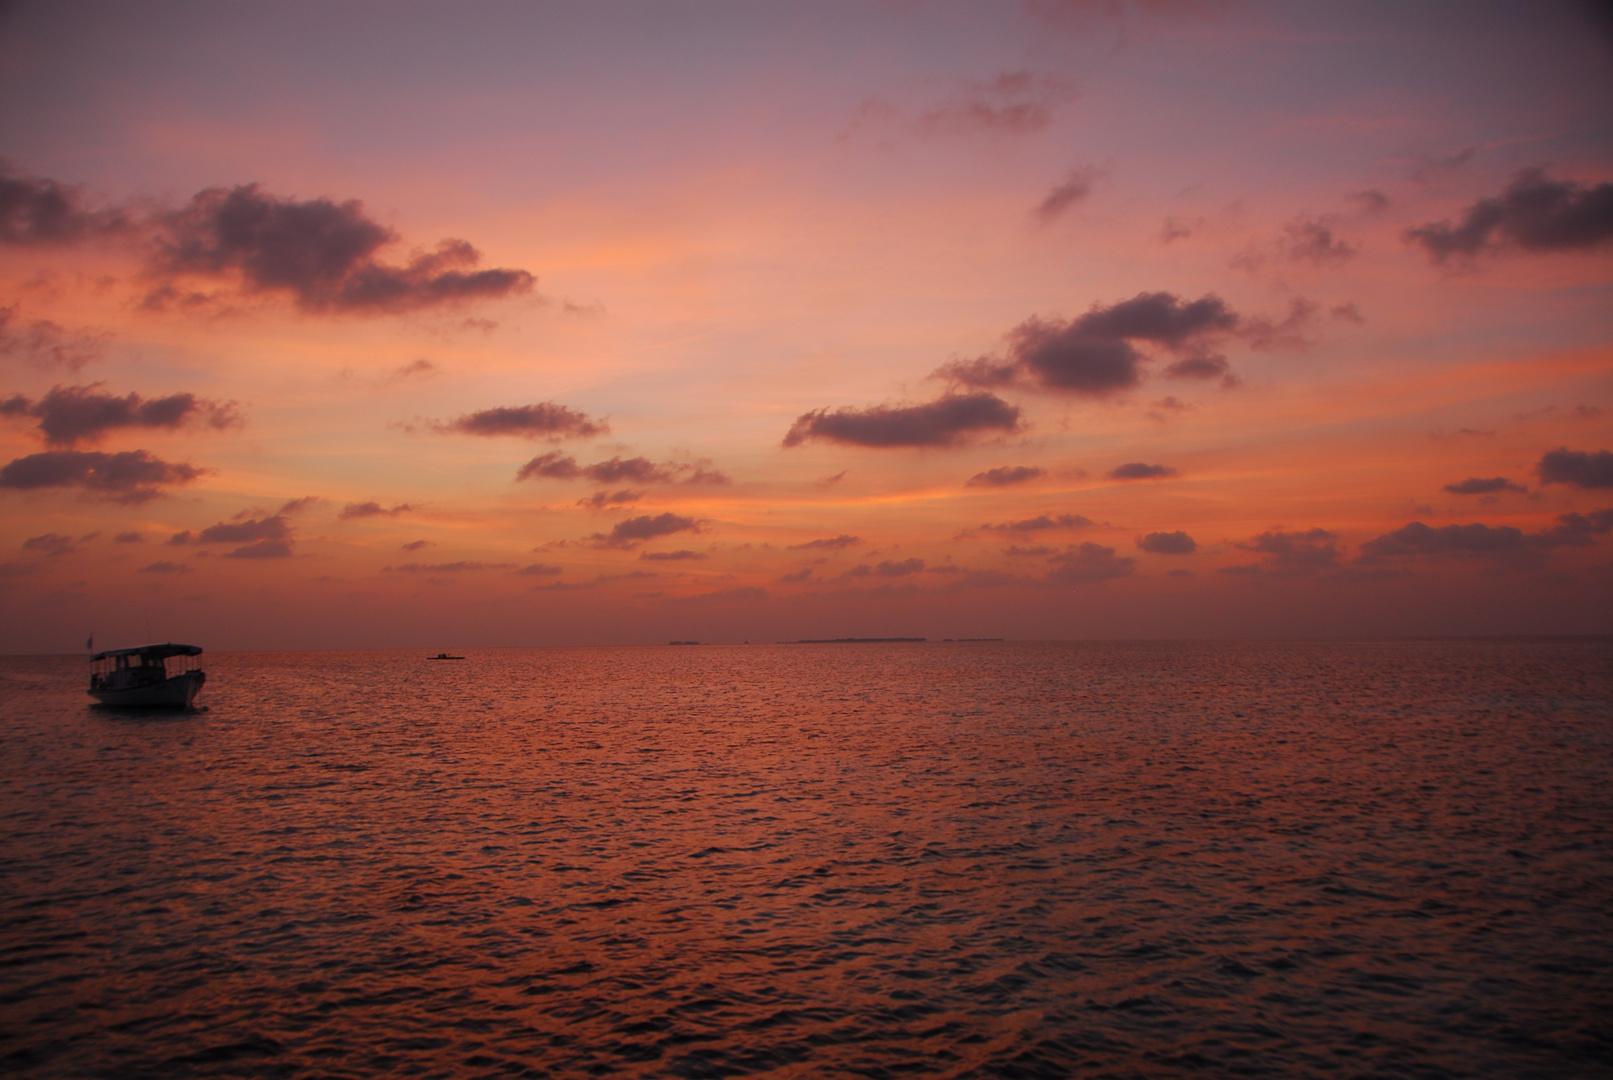 Sonnenuntergang auf der Insel Mirihi